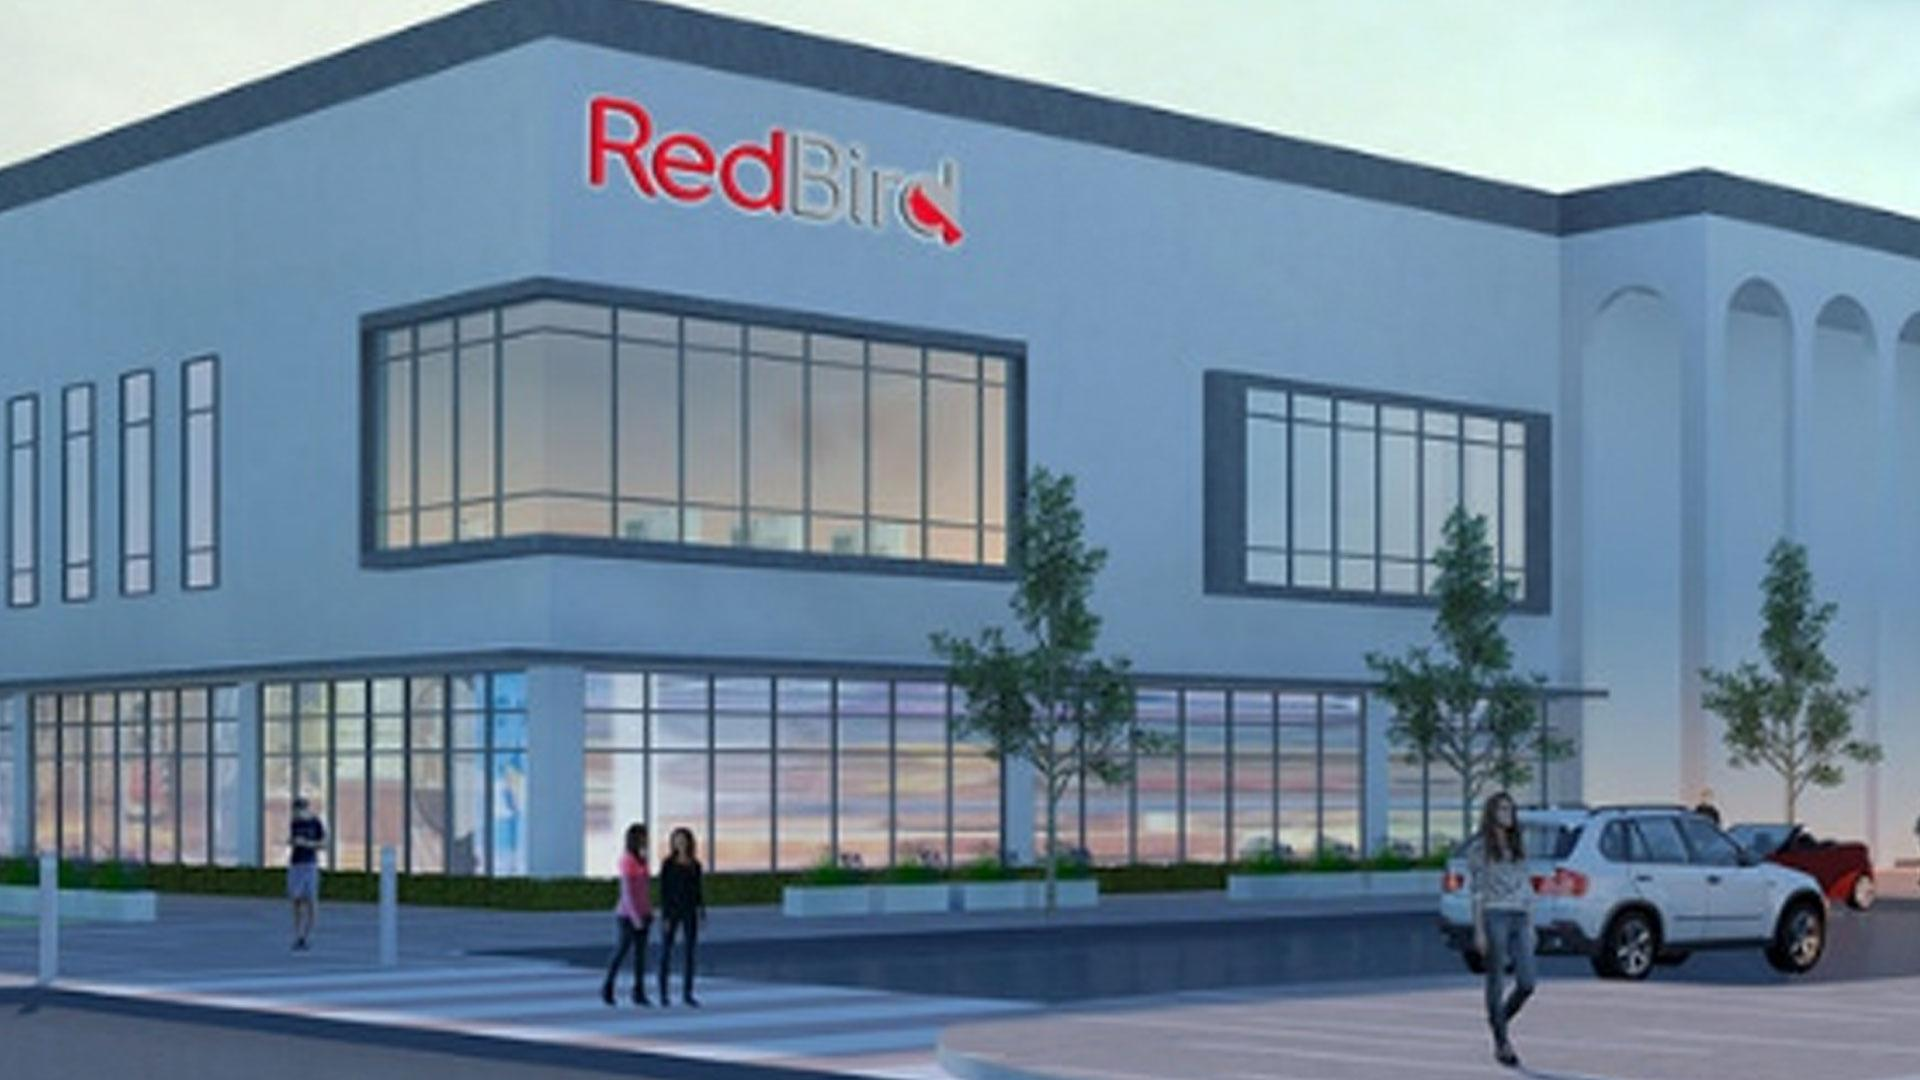 redbird-brand-identity-signage-on-office-building